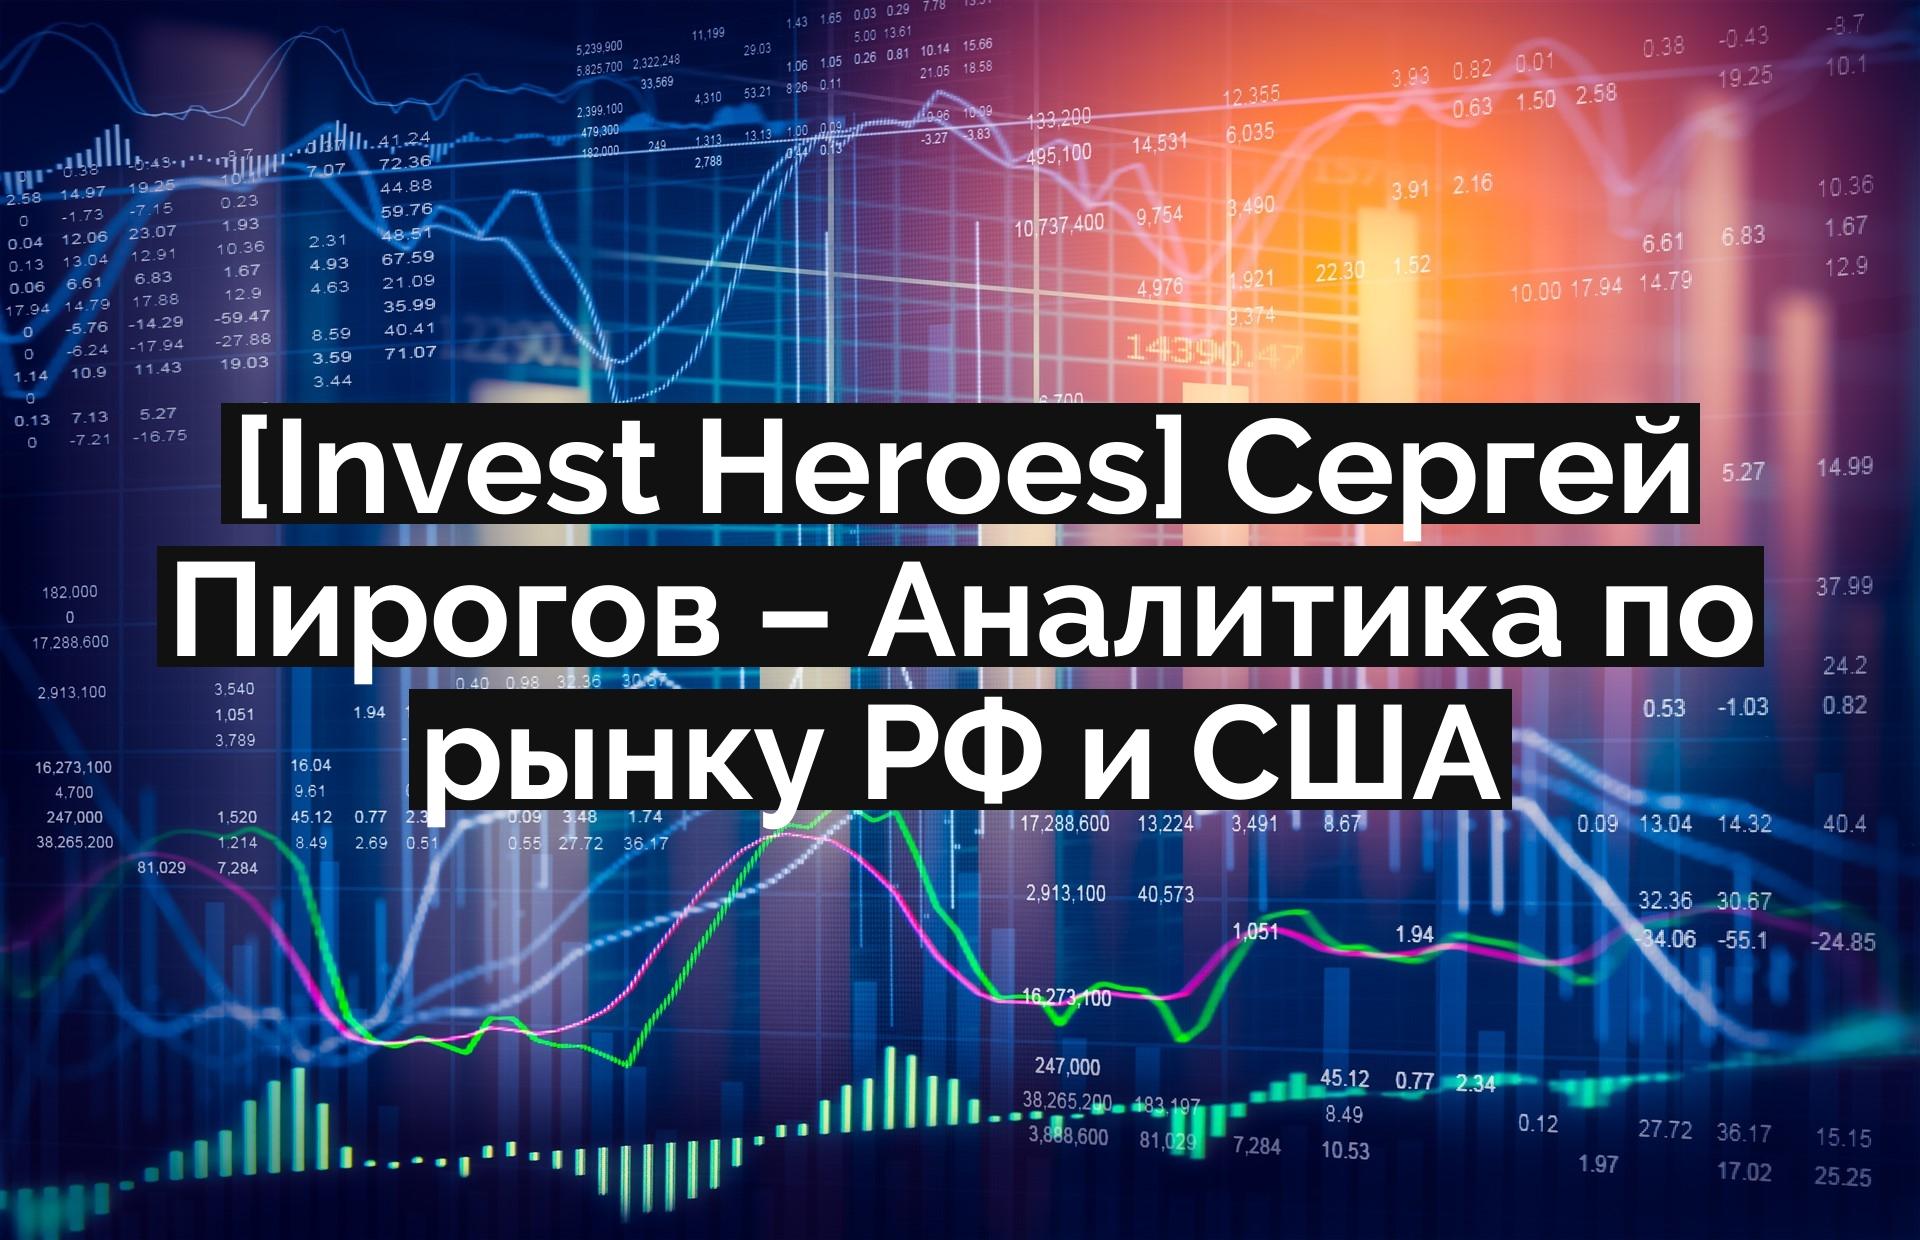 [Invest Heroes] Сергей Пирогов – Аналитика по рынку РФ и США